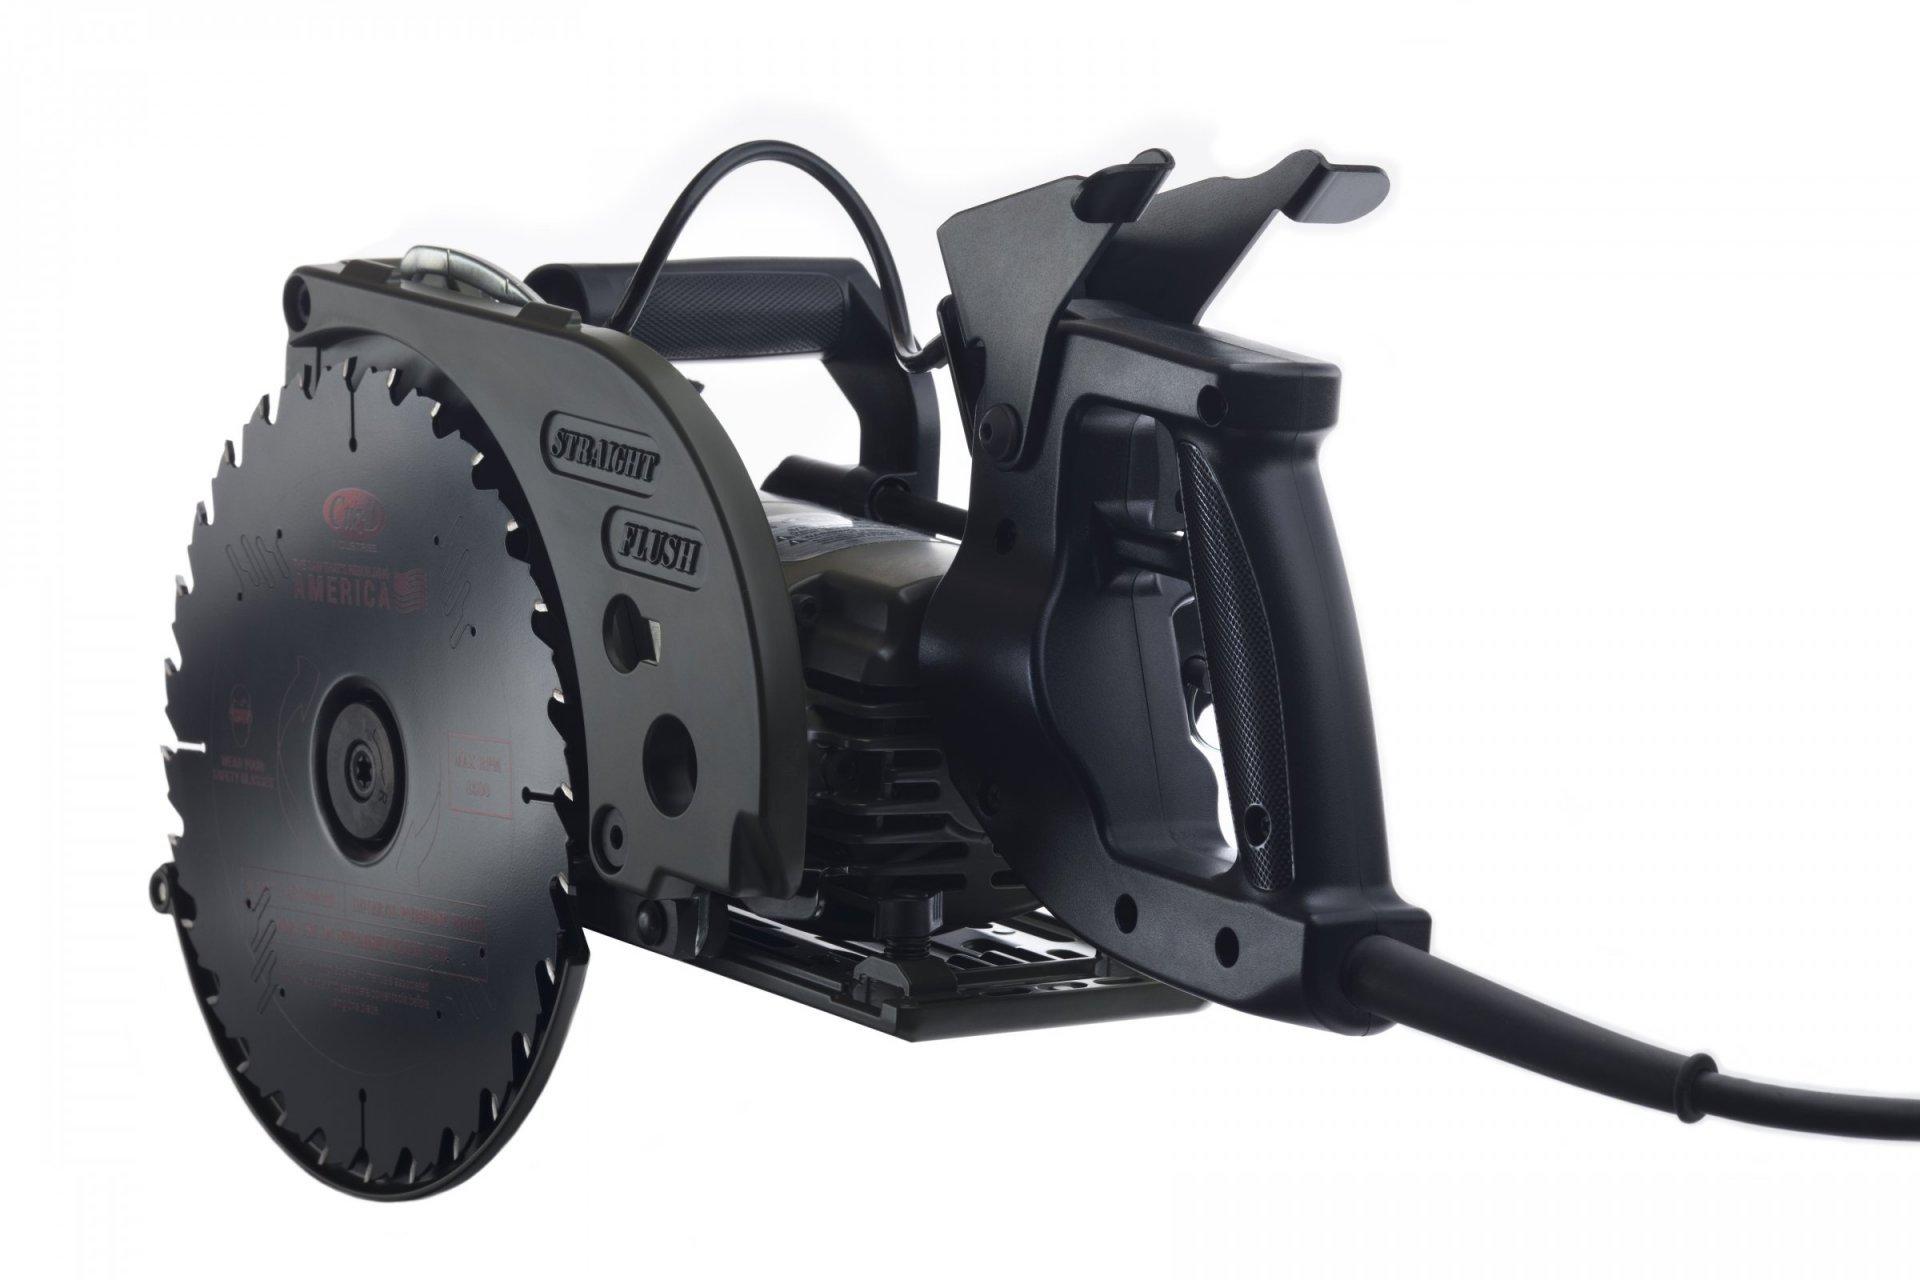 Cuz-D Straight Flush Saw: higher torque motor